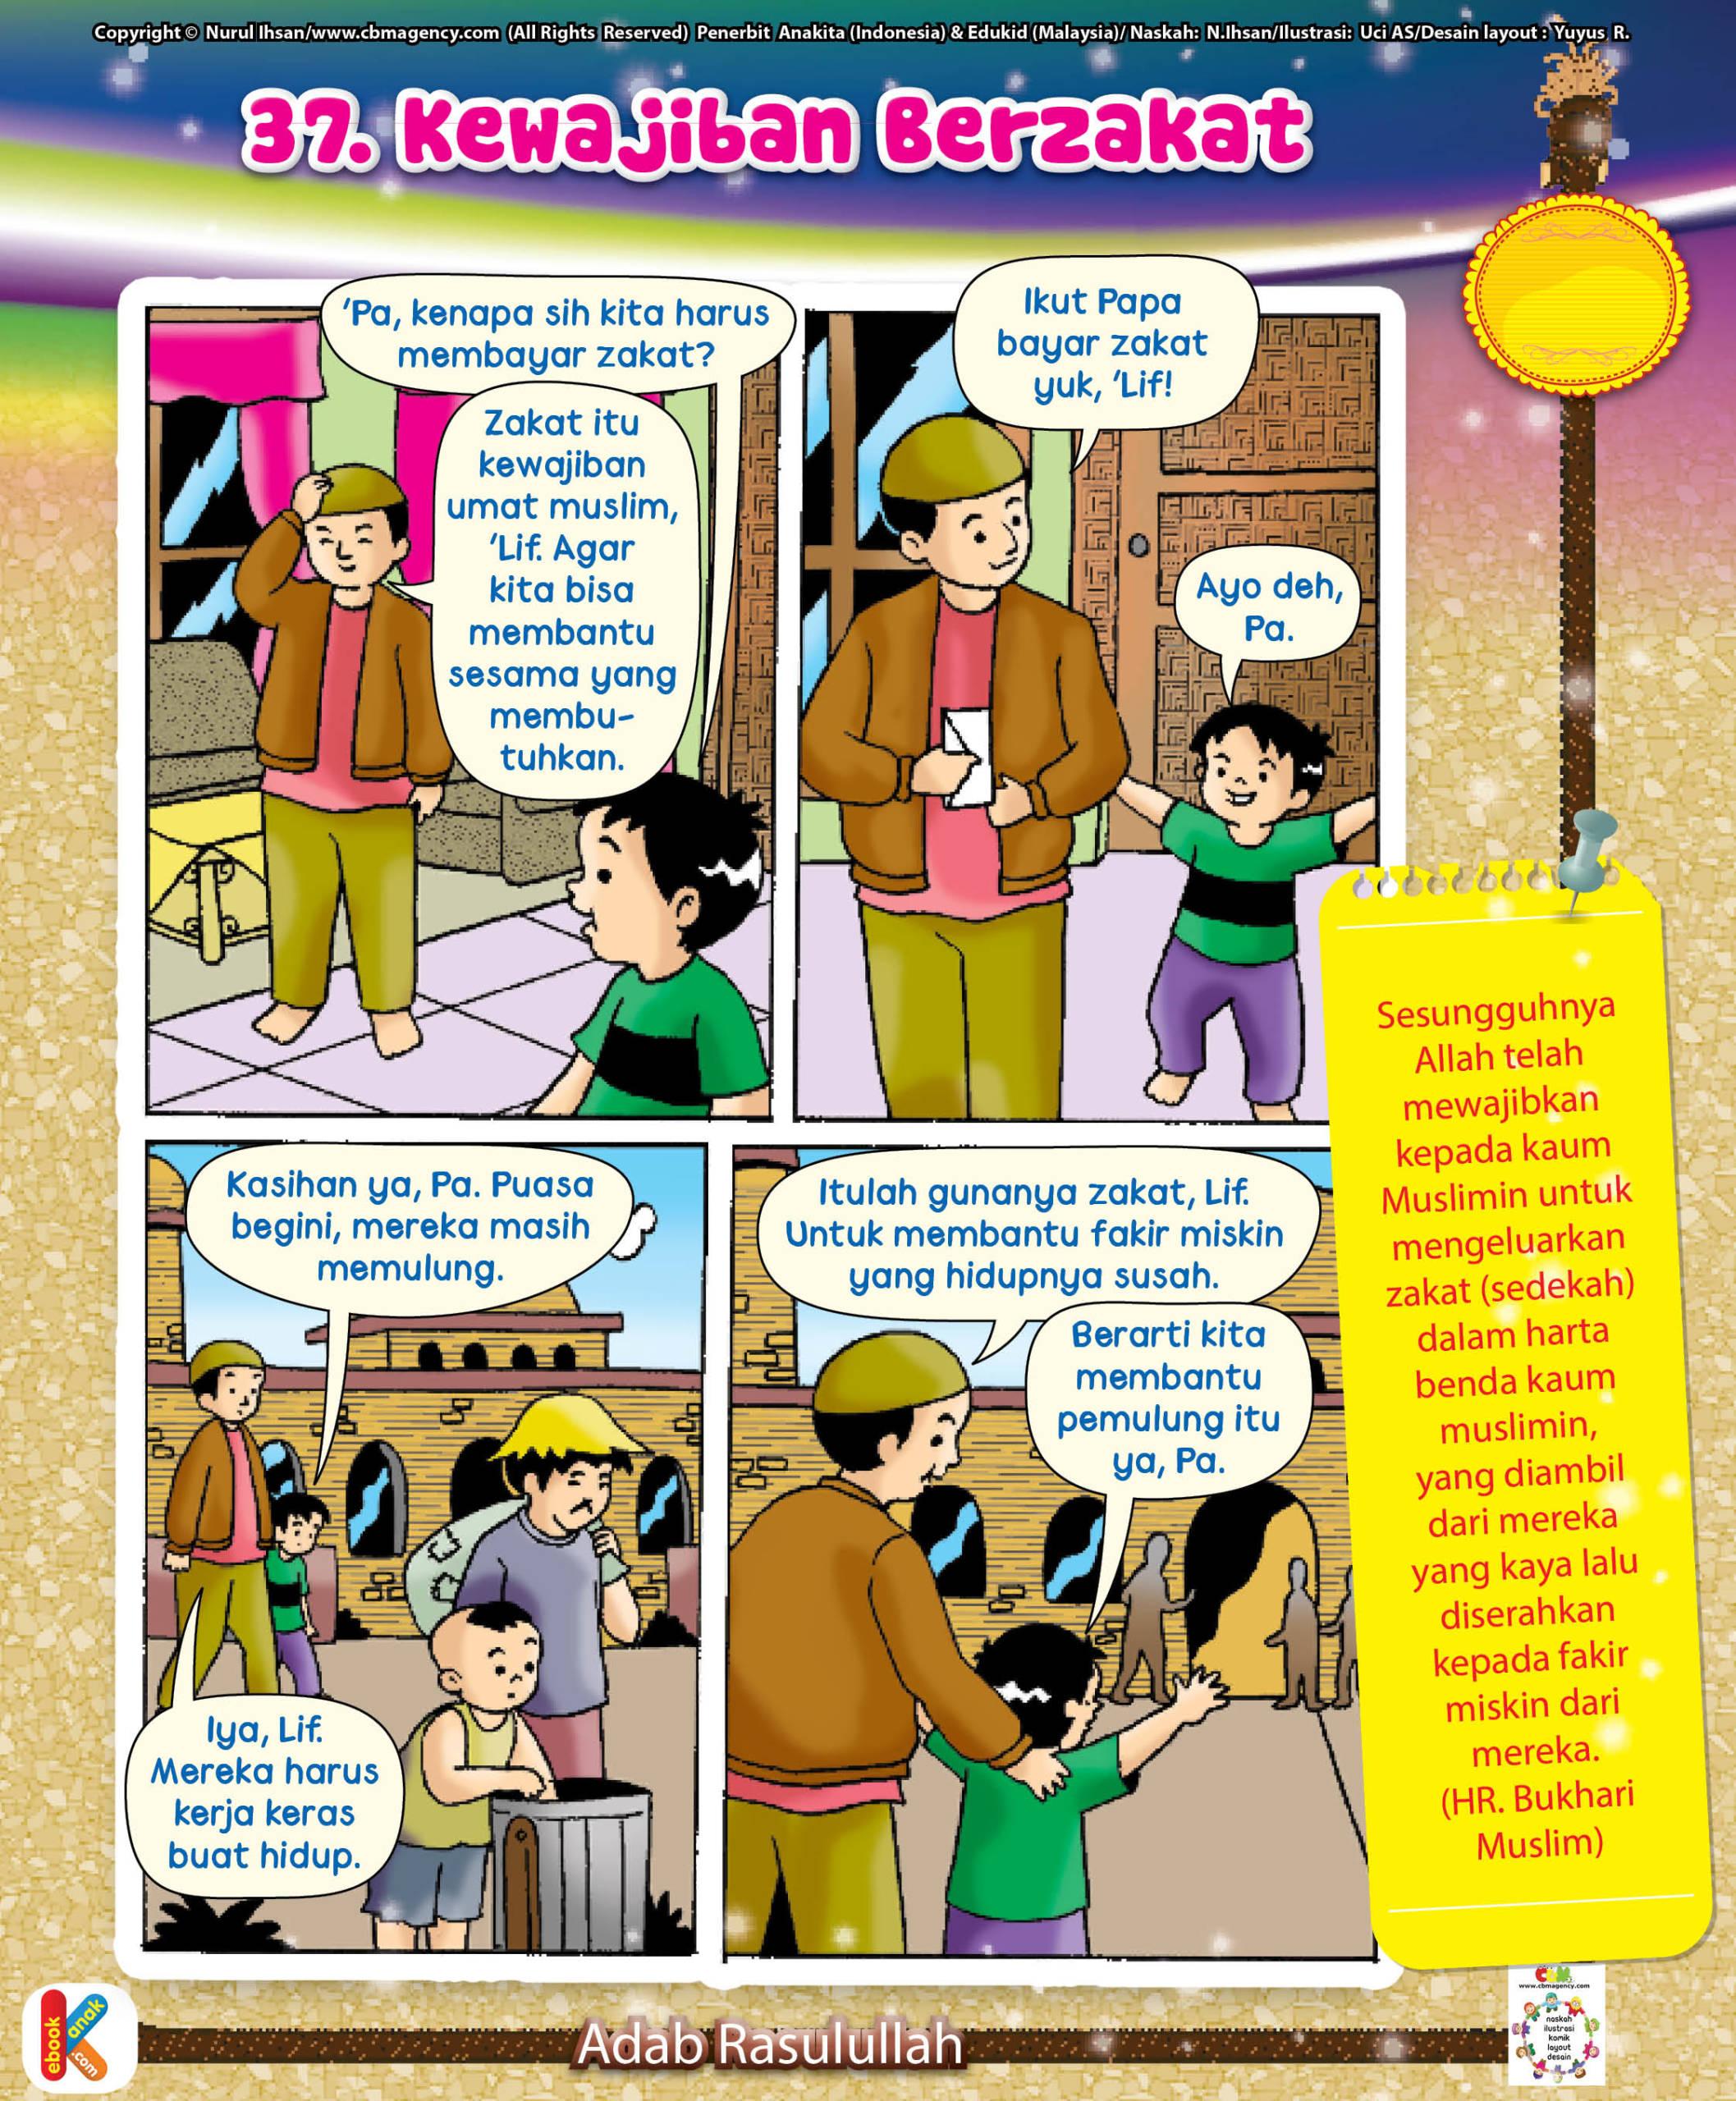 Contoh Kewajiban Anak Di Sekolah : contoh, kewajiban, sekolah, Komik, Kewajiban, Rumah, Content